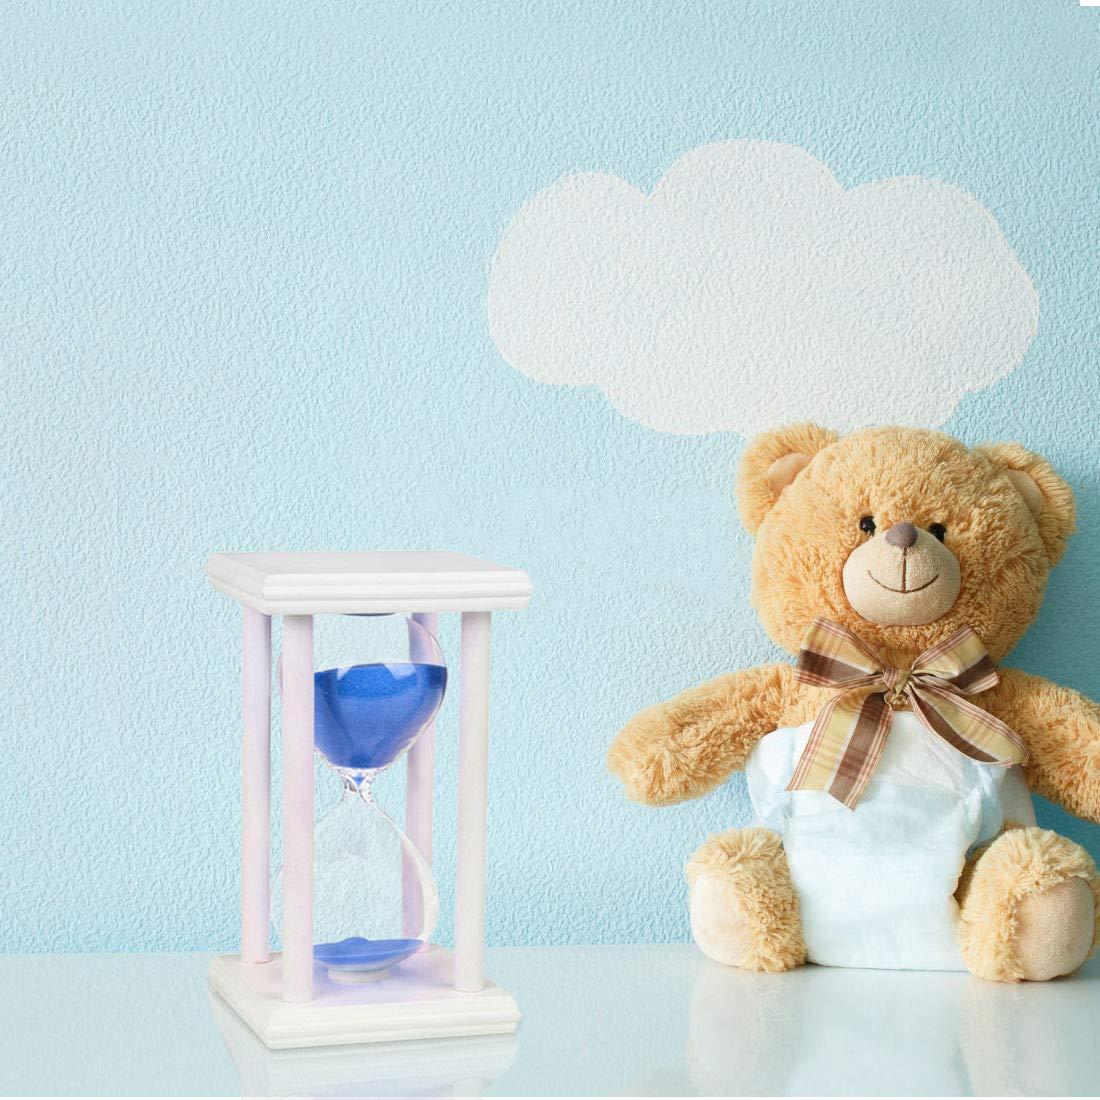 Bojin legno telaio bianco blu sabbia vetro clessidra clessidra Contaore per bambini sabbia orologio clessidra timer clessidra clessidra clessidra sabbia orologio Game Home Decoration 15 mins Blue